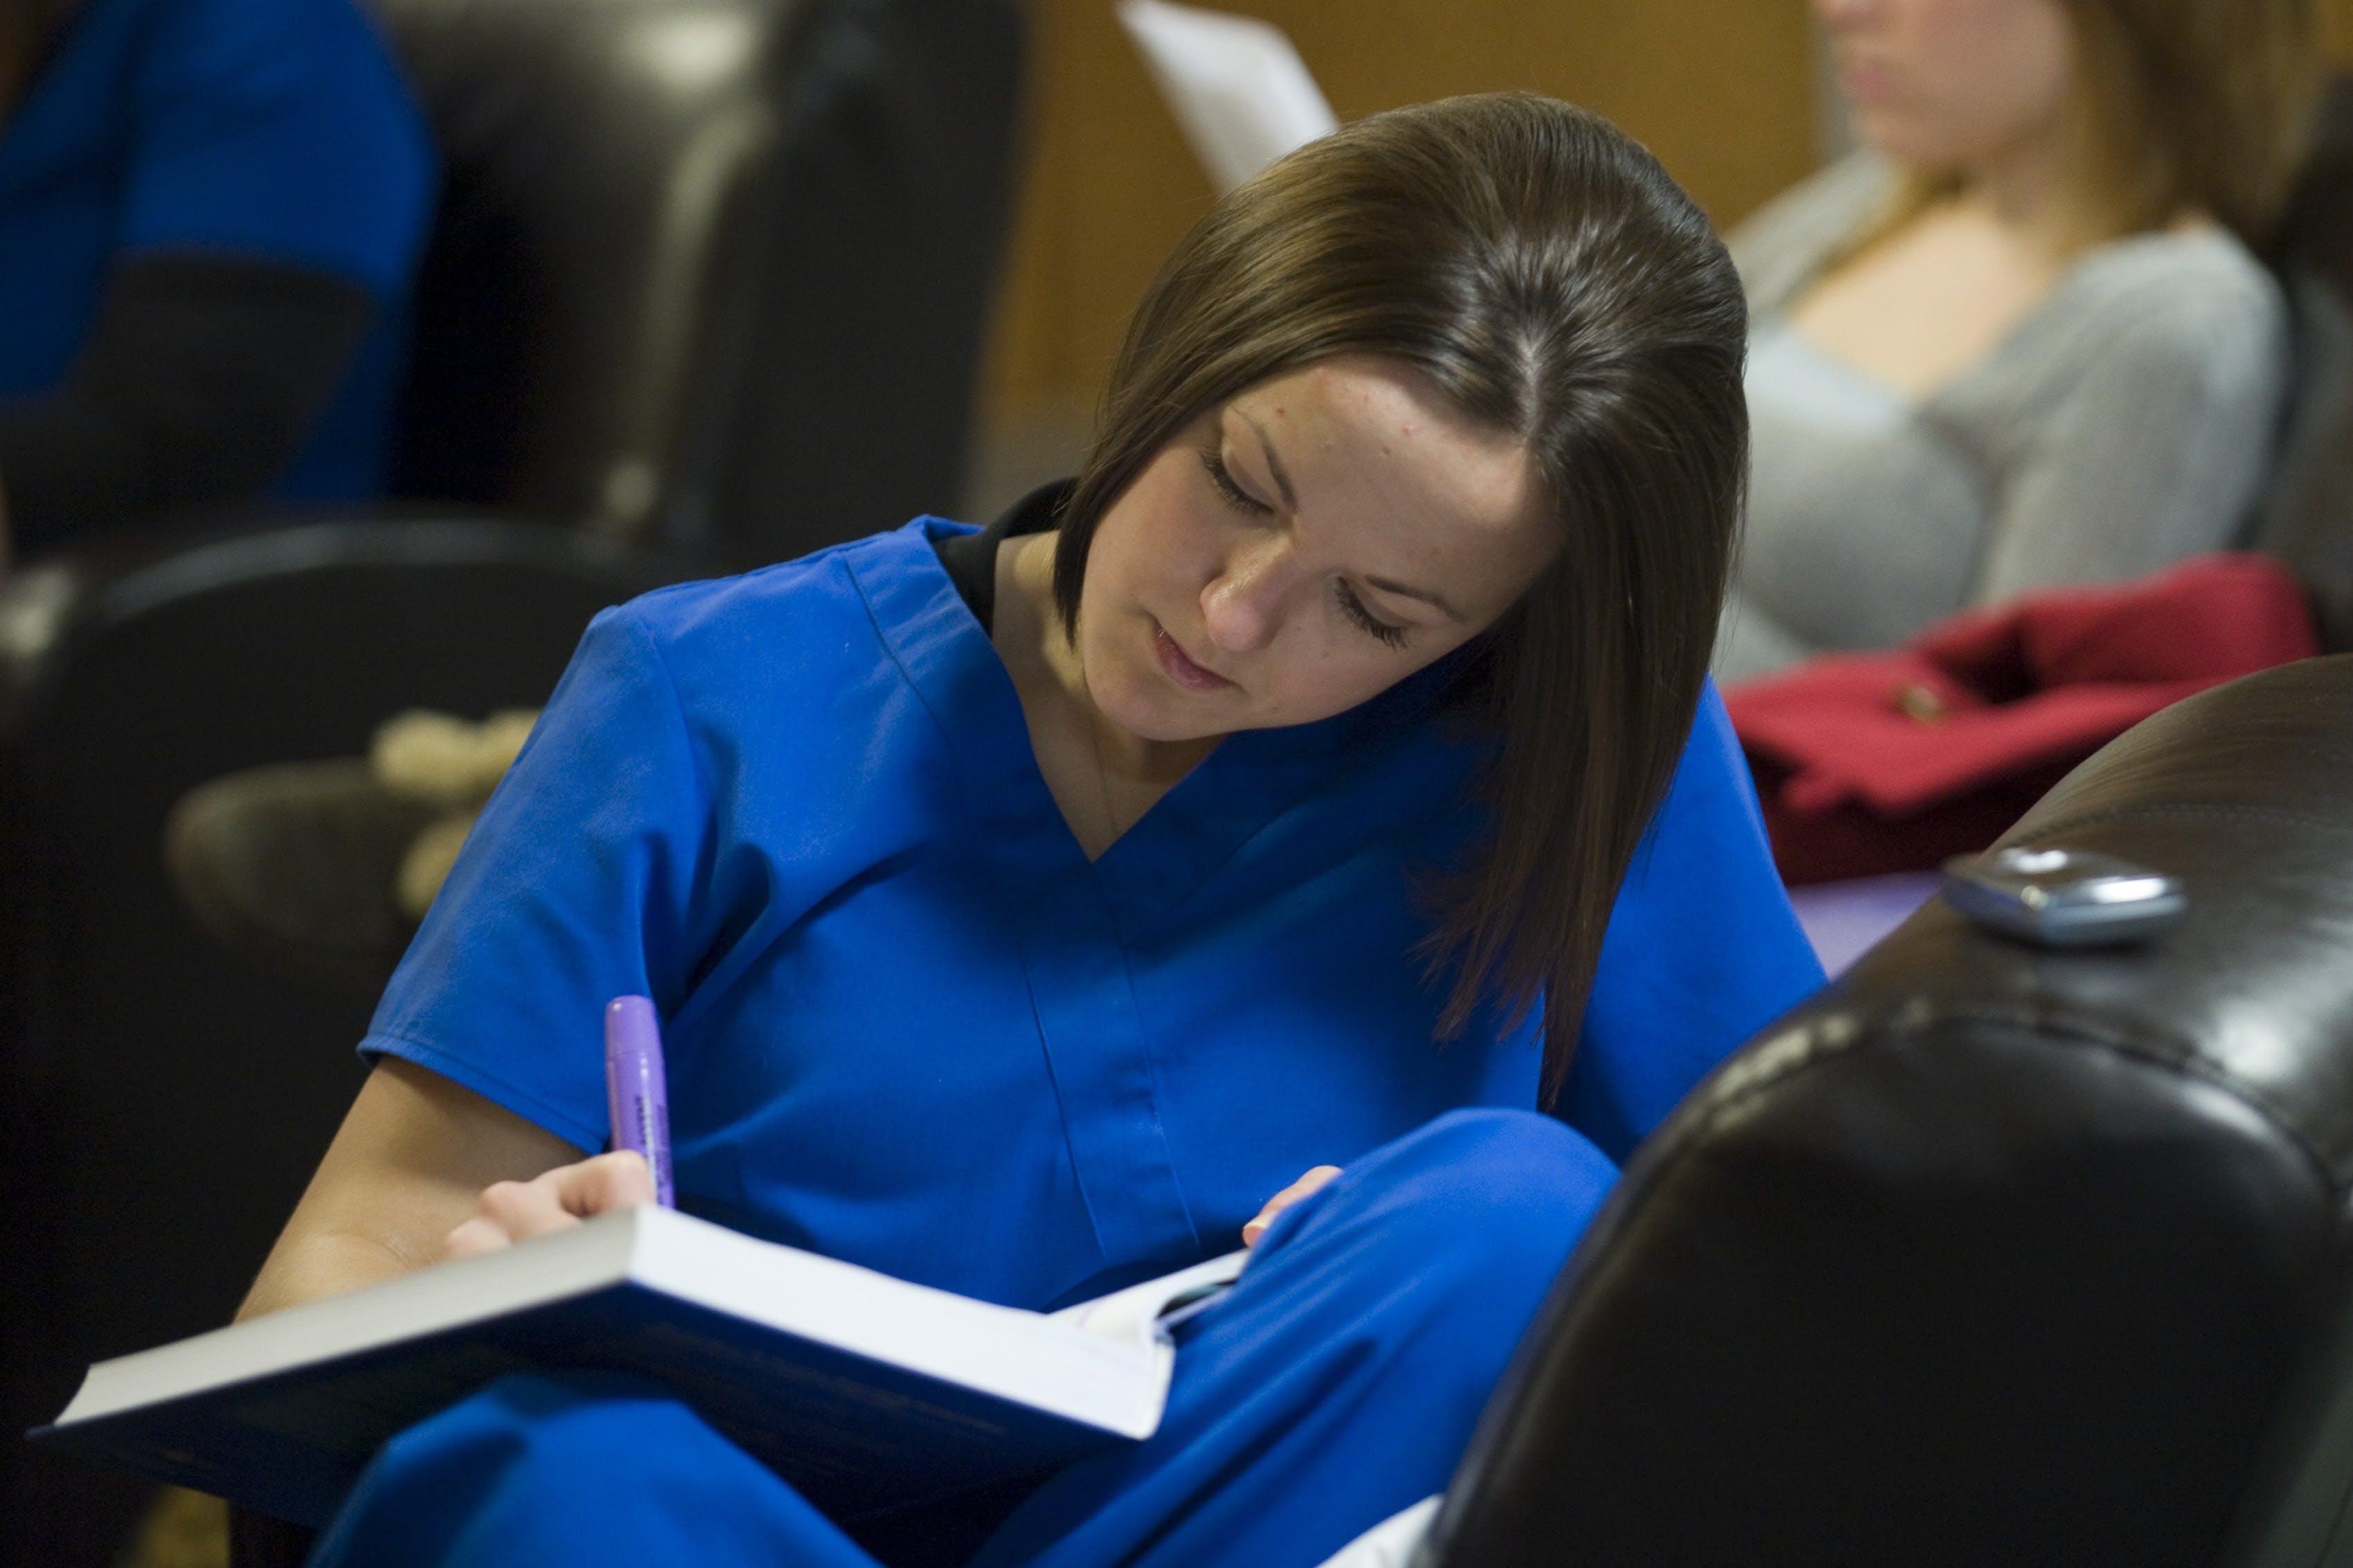 Nursing student at Bethel University